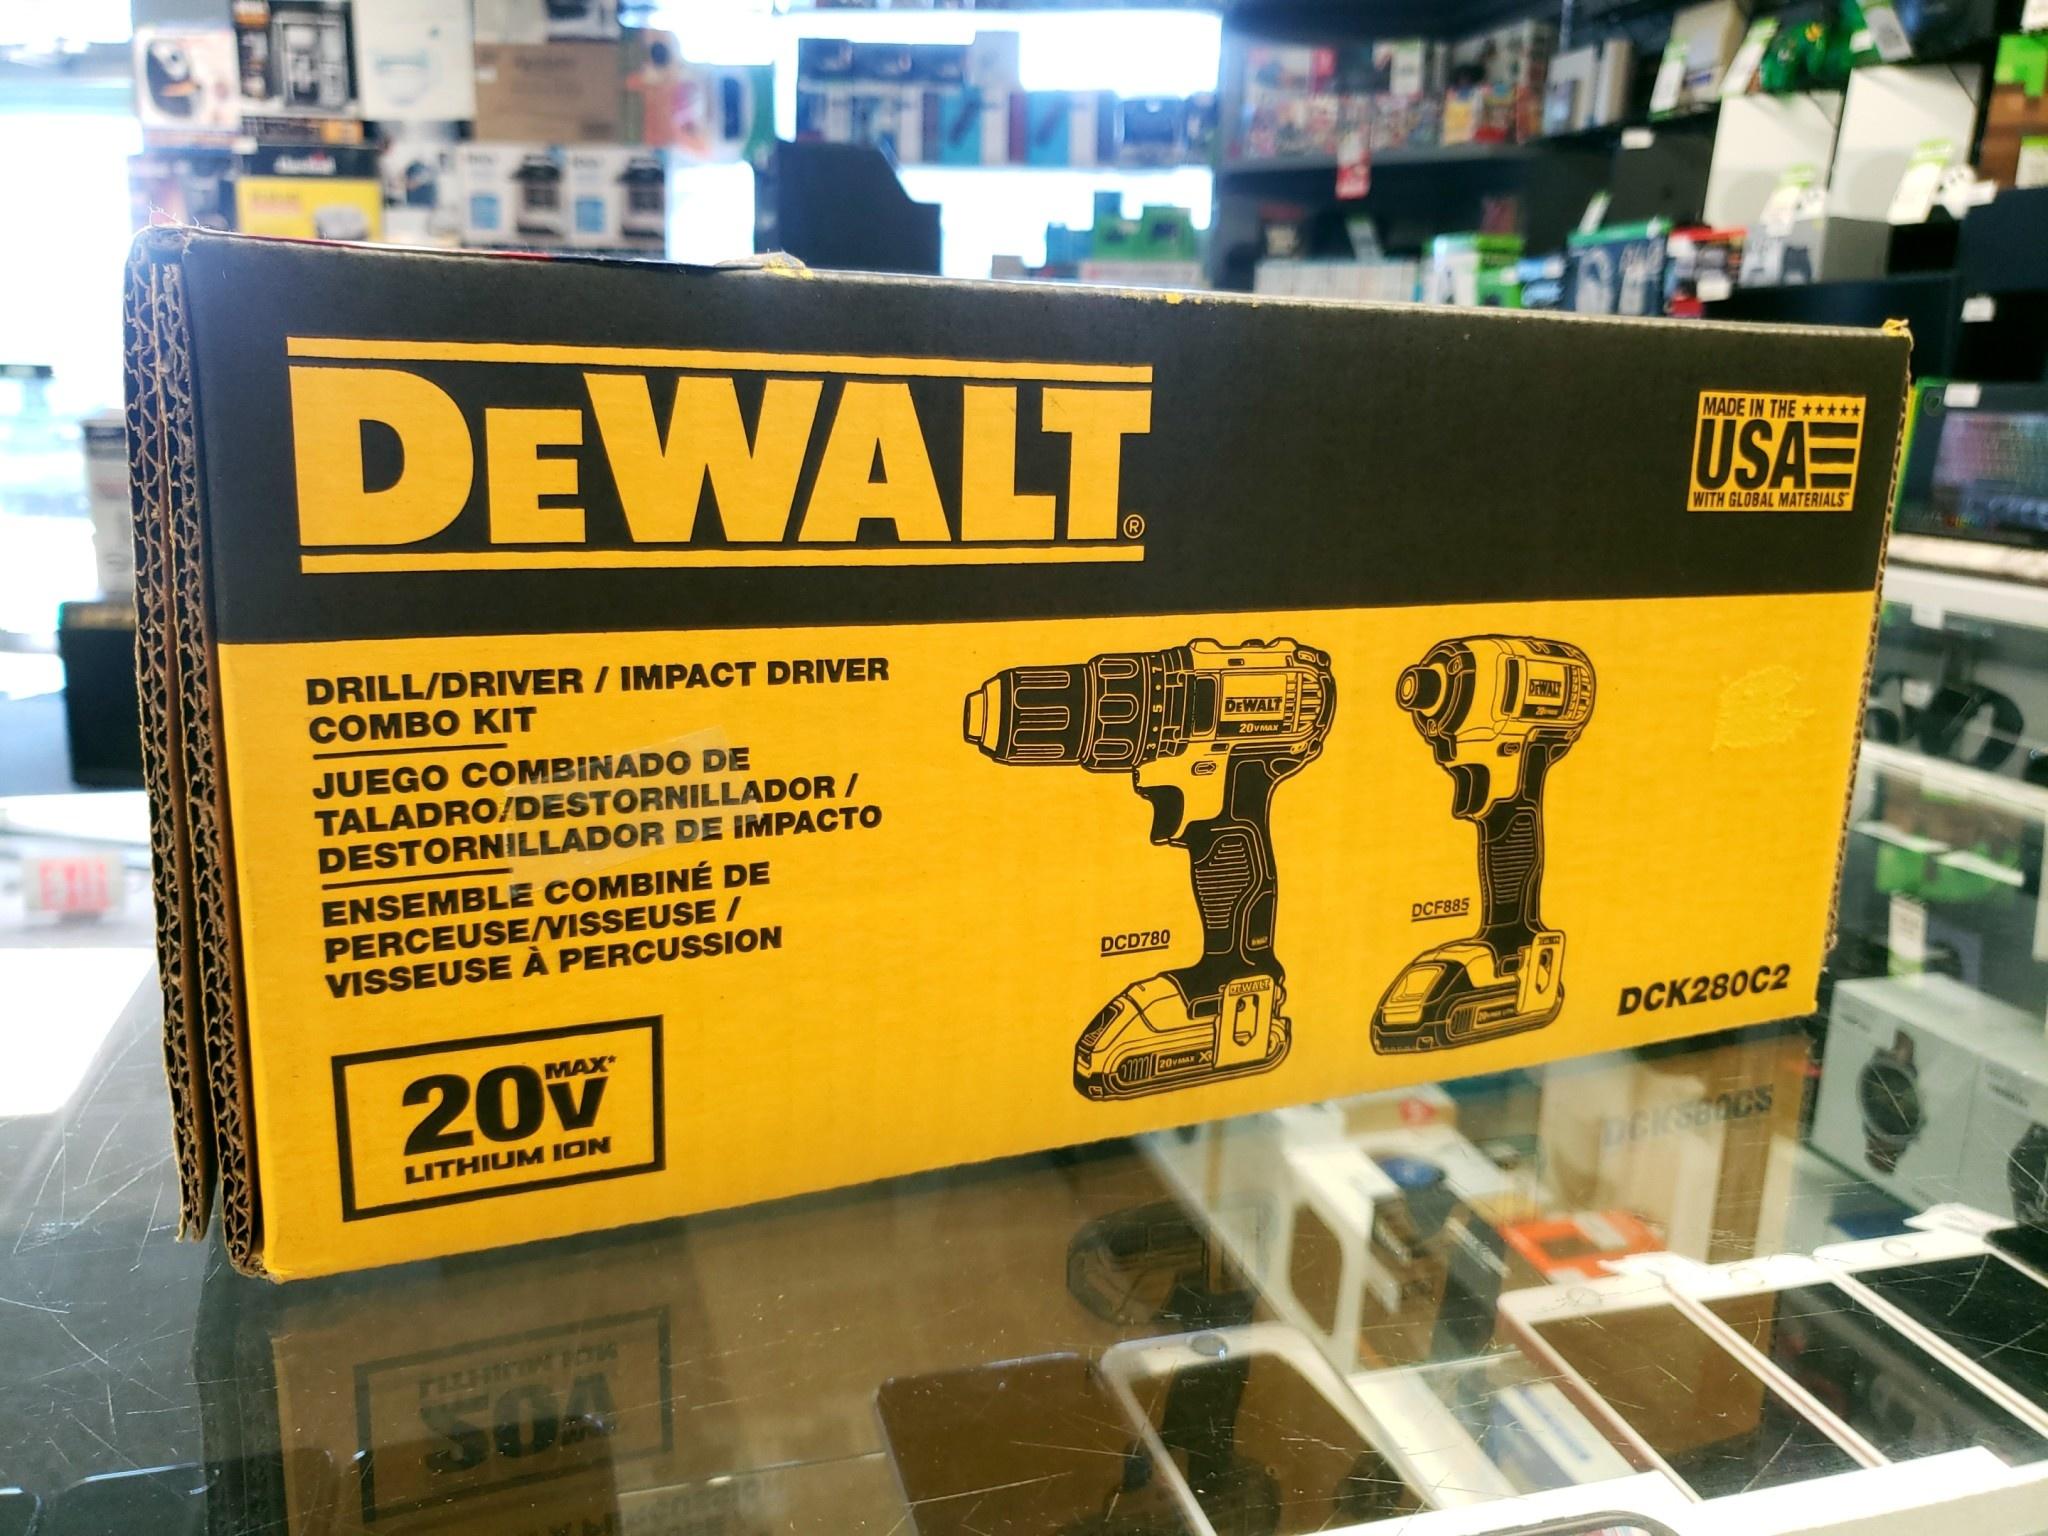 New - DeWalt 20 Volt Max XR Cordless Drill/Impact Driver Combo Kit - DCK283C2